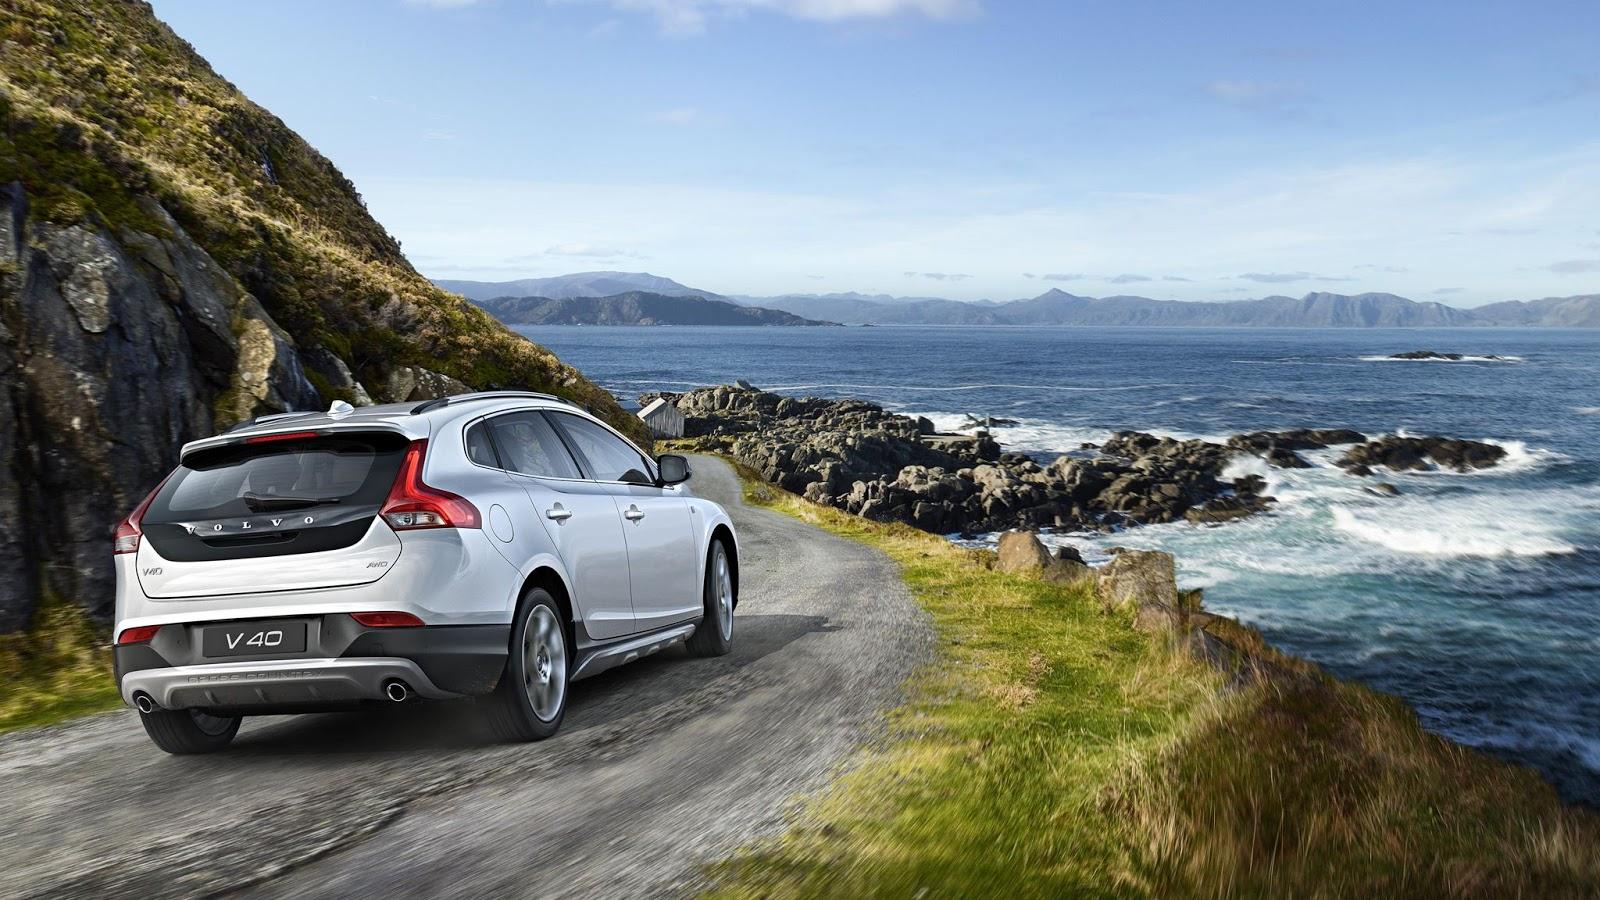 f1 Οδηγούμε το Volvo V40 Cross Country D2 Ocean Race Ocean Race, TEST, Volvo, Volvo V40, Volvo V40 Cross Country, ΔΟΚΙΜΕΣ